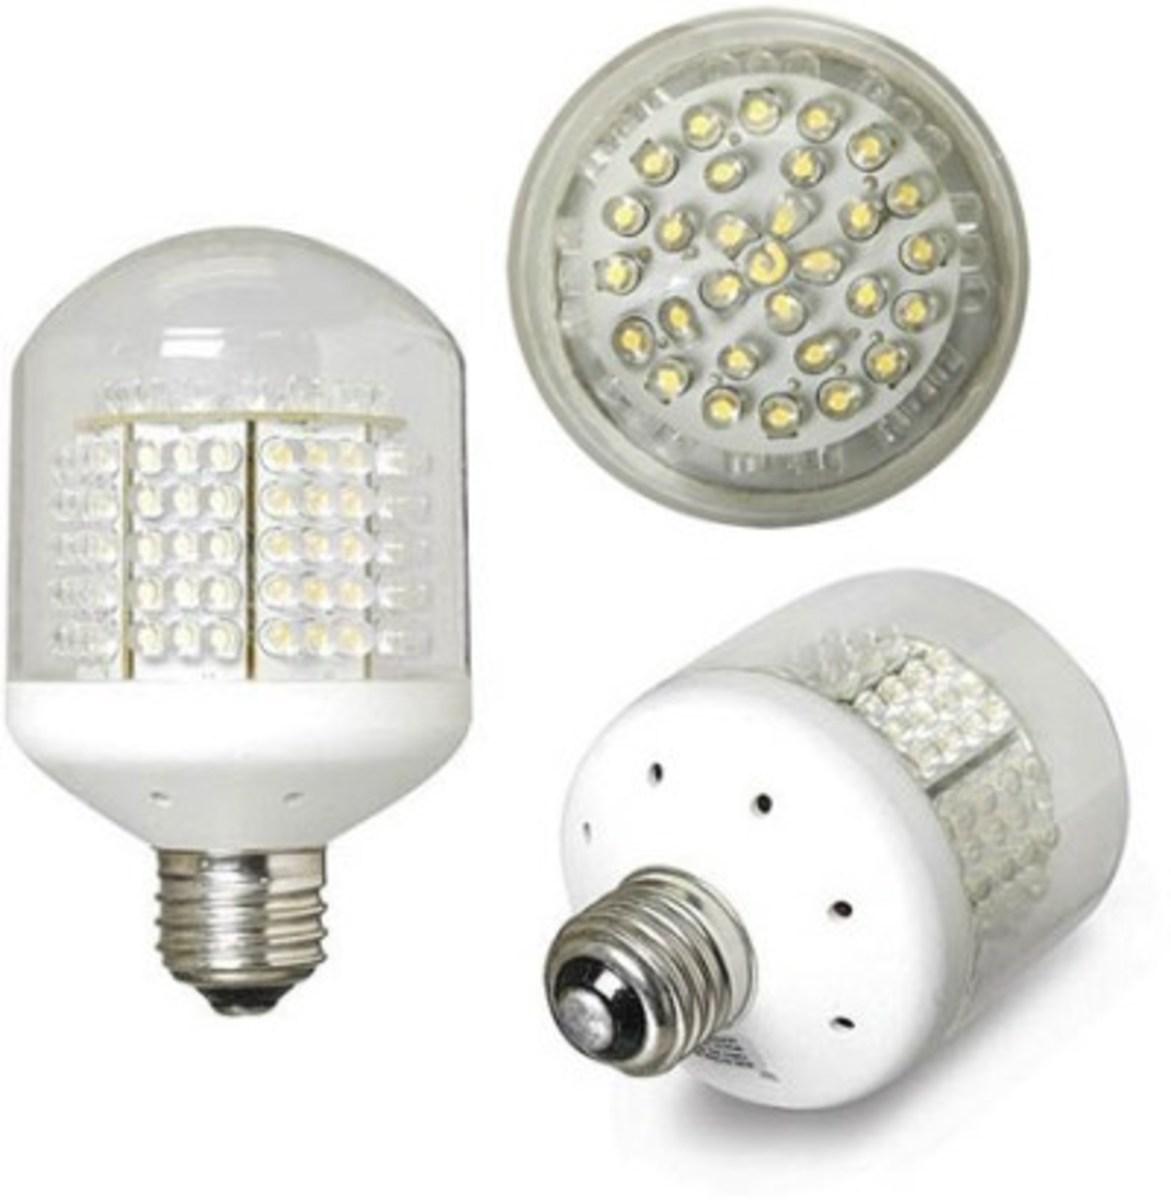 More LED light designs for home interior lighting